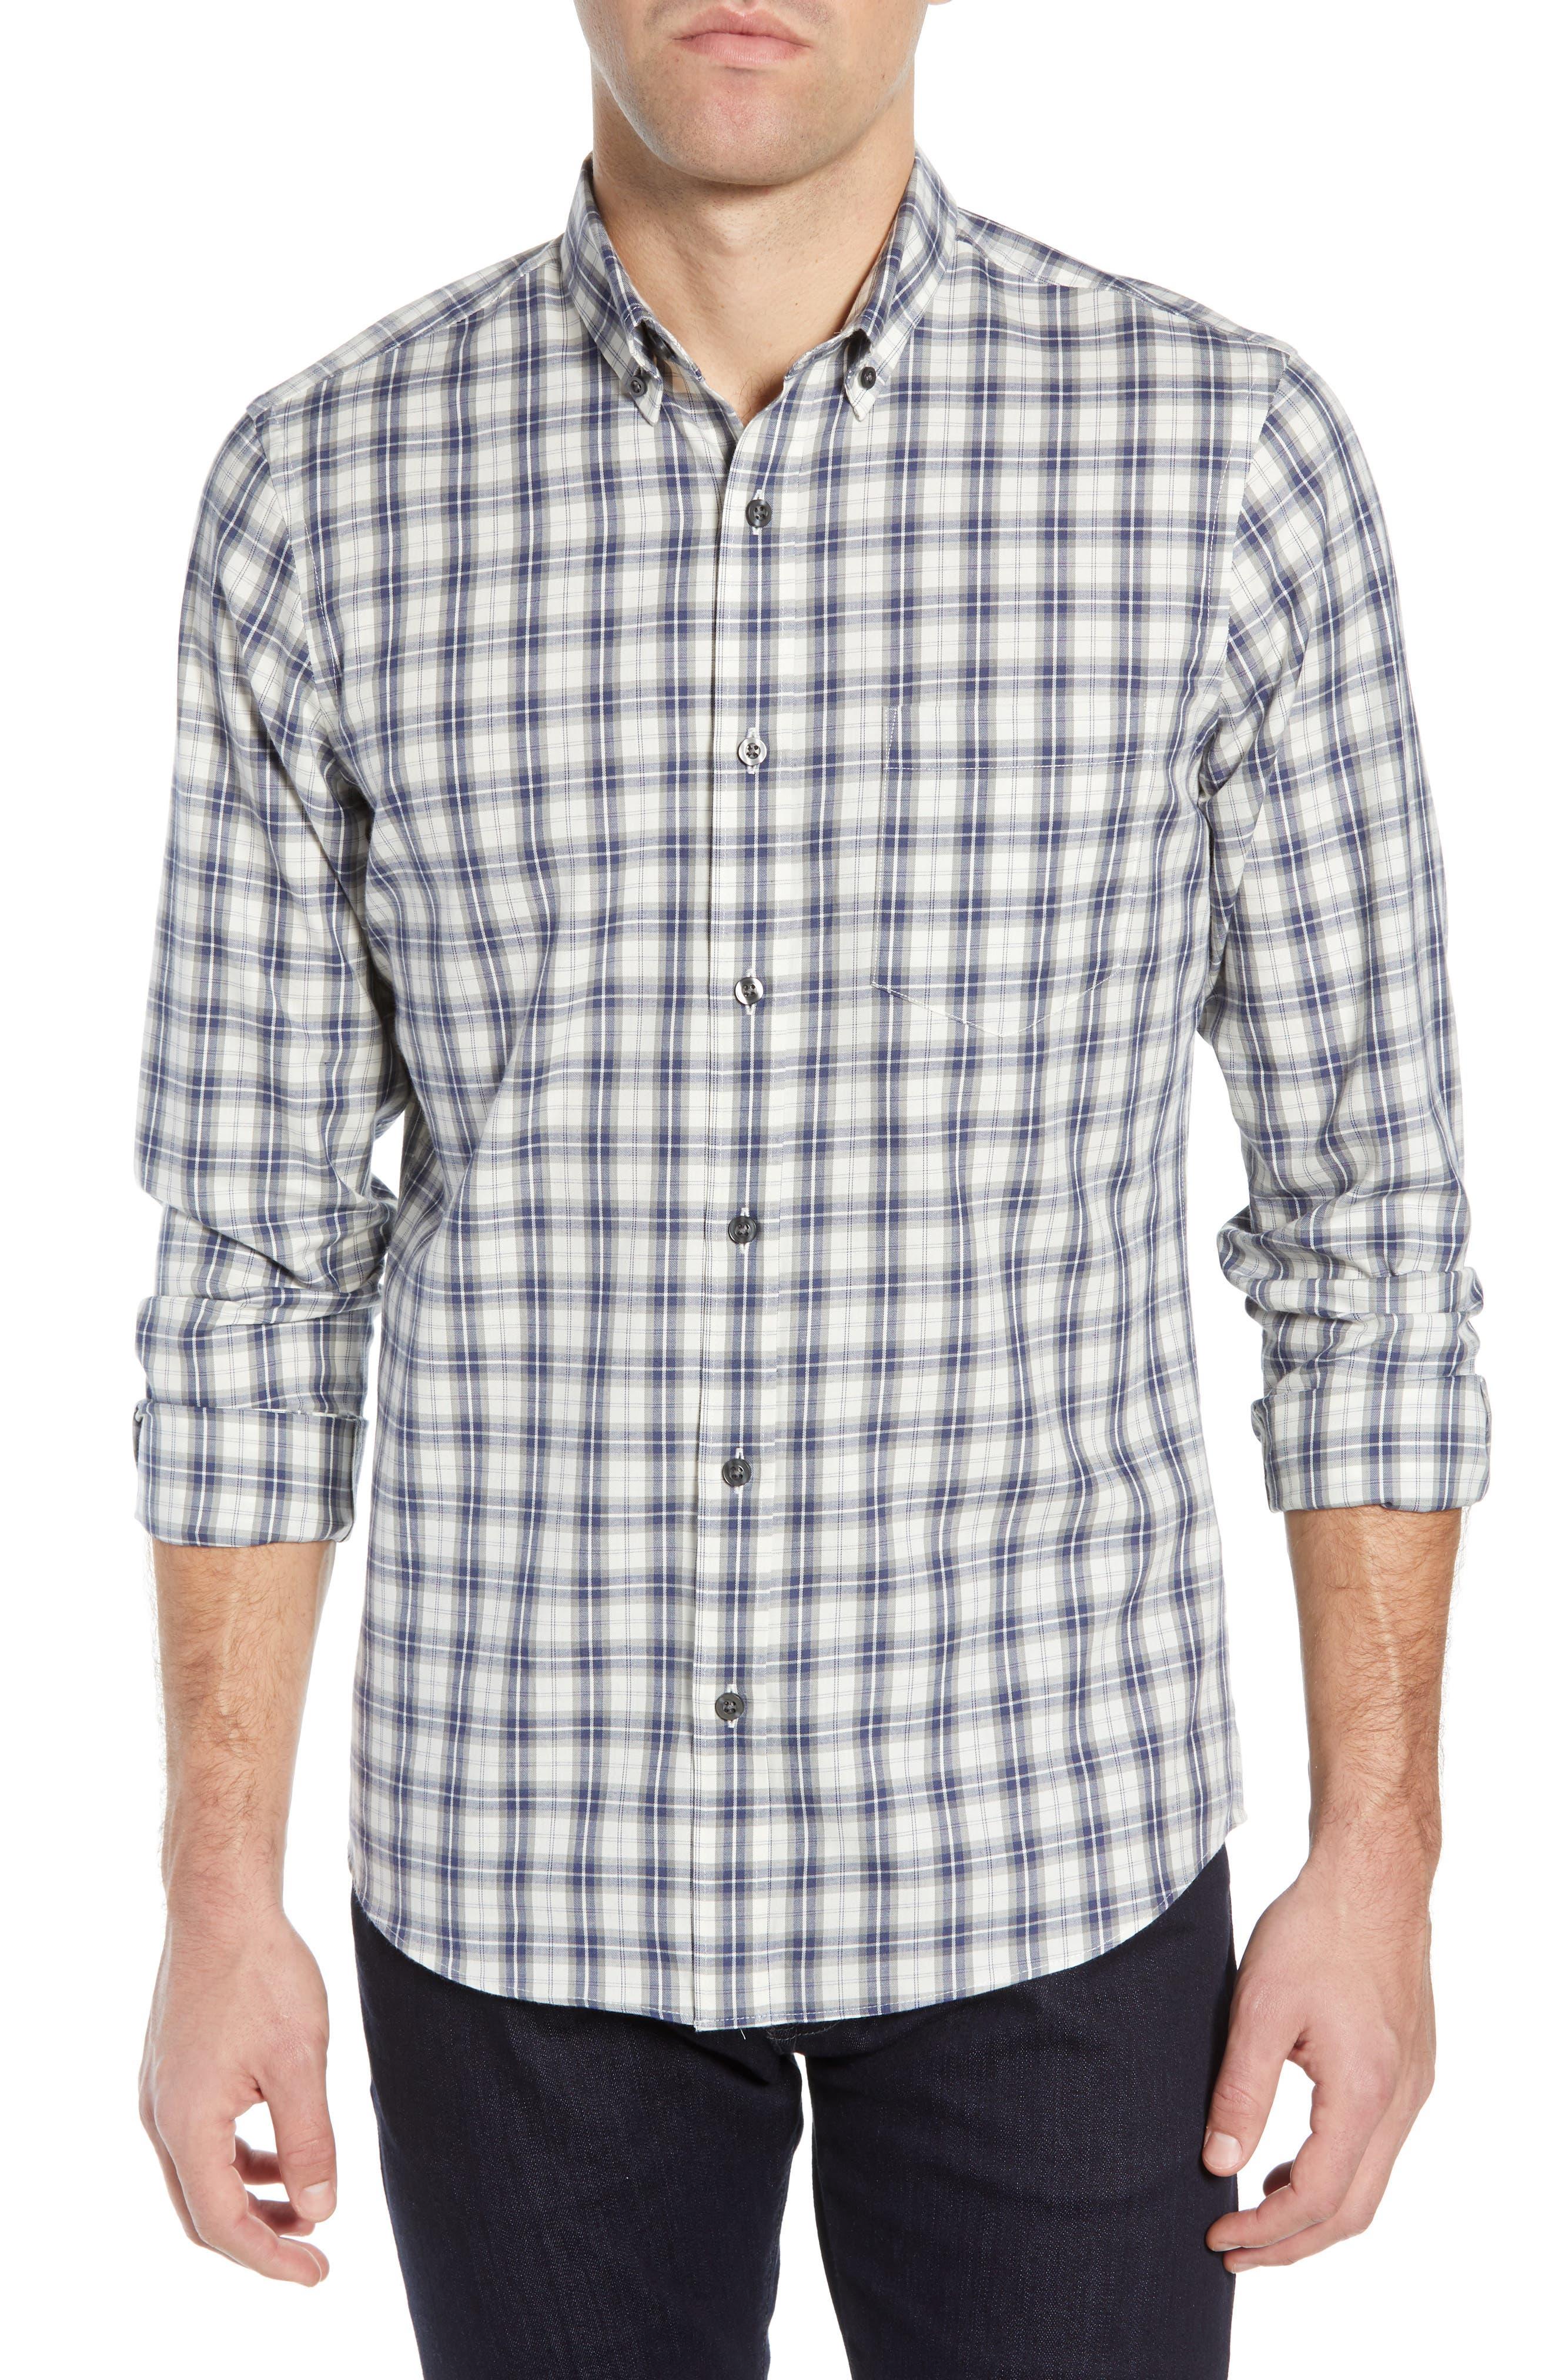 Slim Fit Plaid Sport Shirt,                             Main thumbnail 1, color,                             WHITE BLUE ENSIGN GREY PLAID